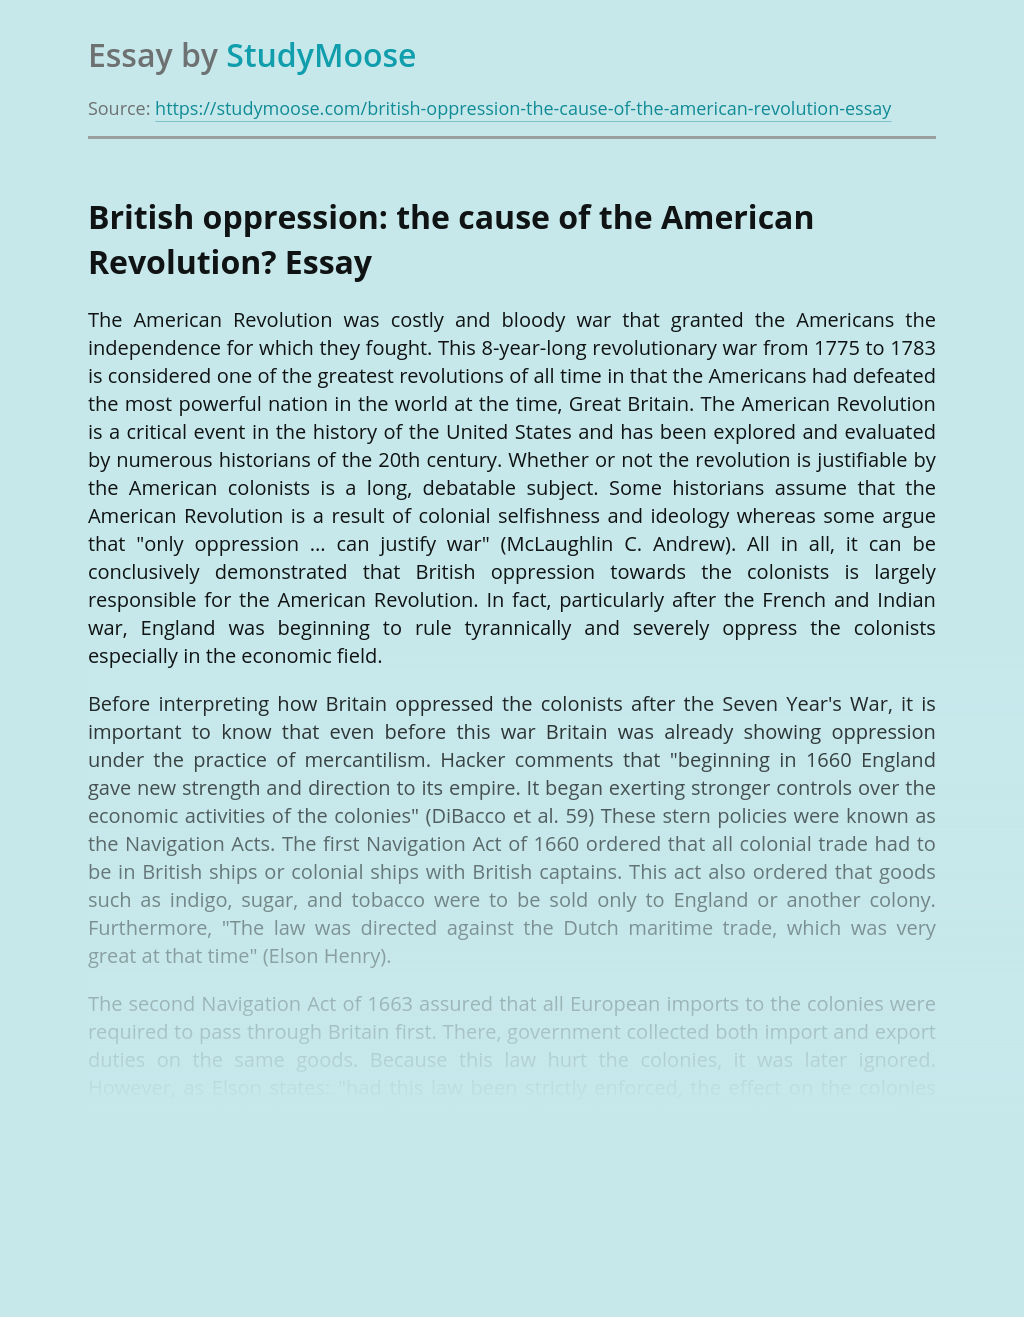 British oppression: the cause of the American Revolution?